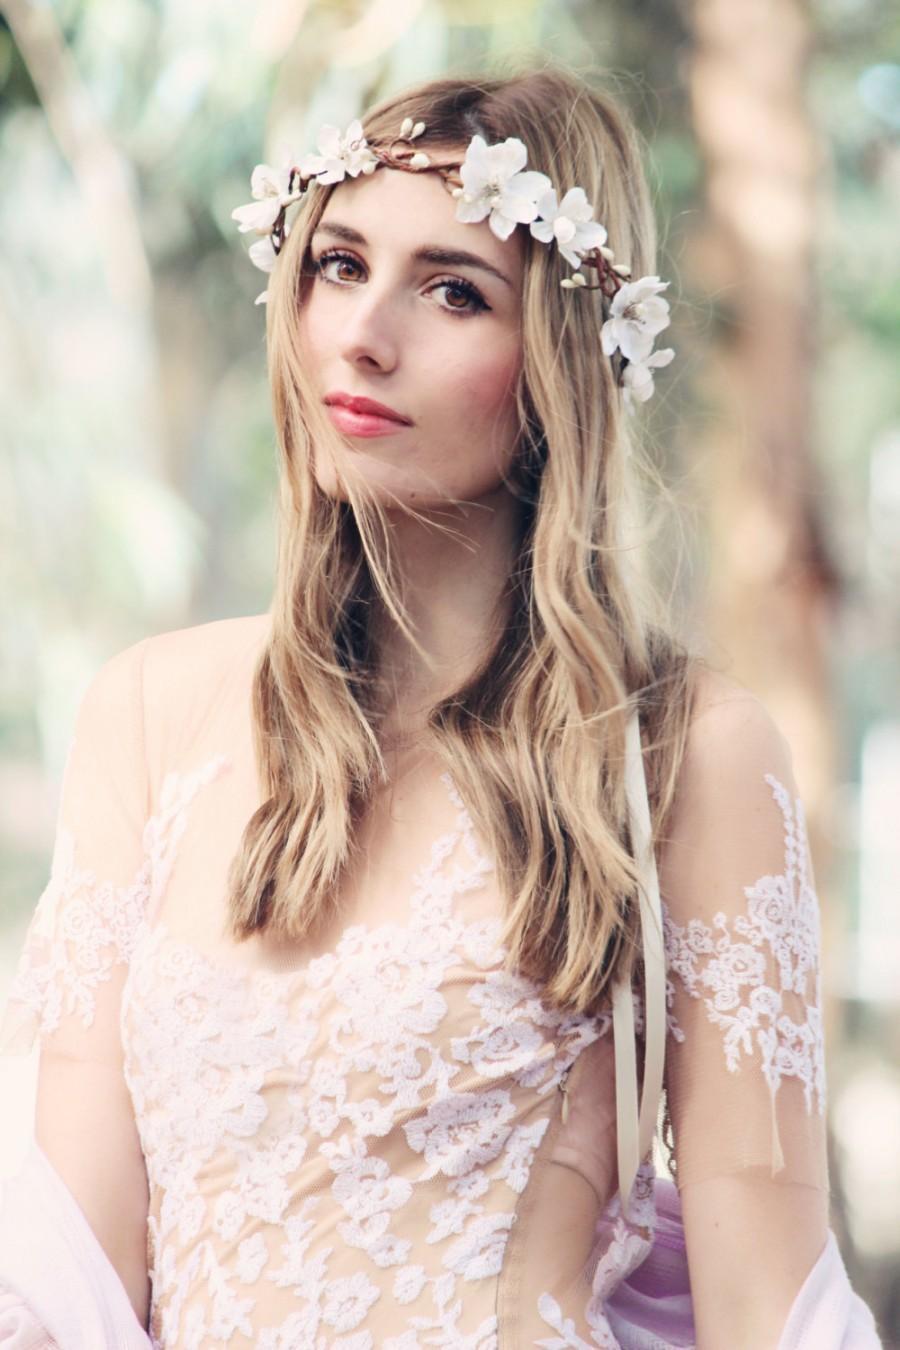 Ivory Boho Wedding Wreath Cream Bridal Flower Crown Headband Headpiece Accessories